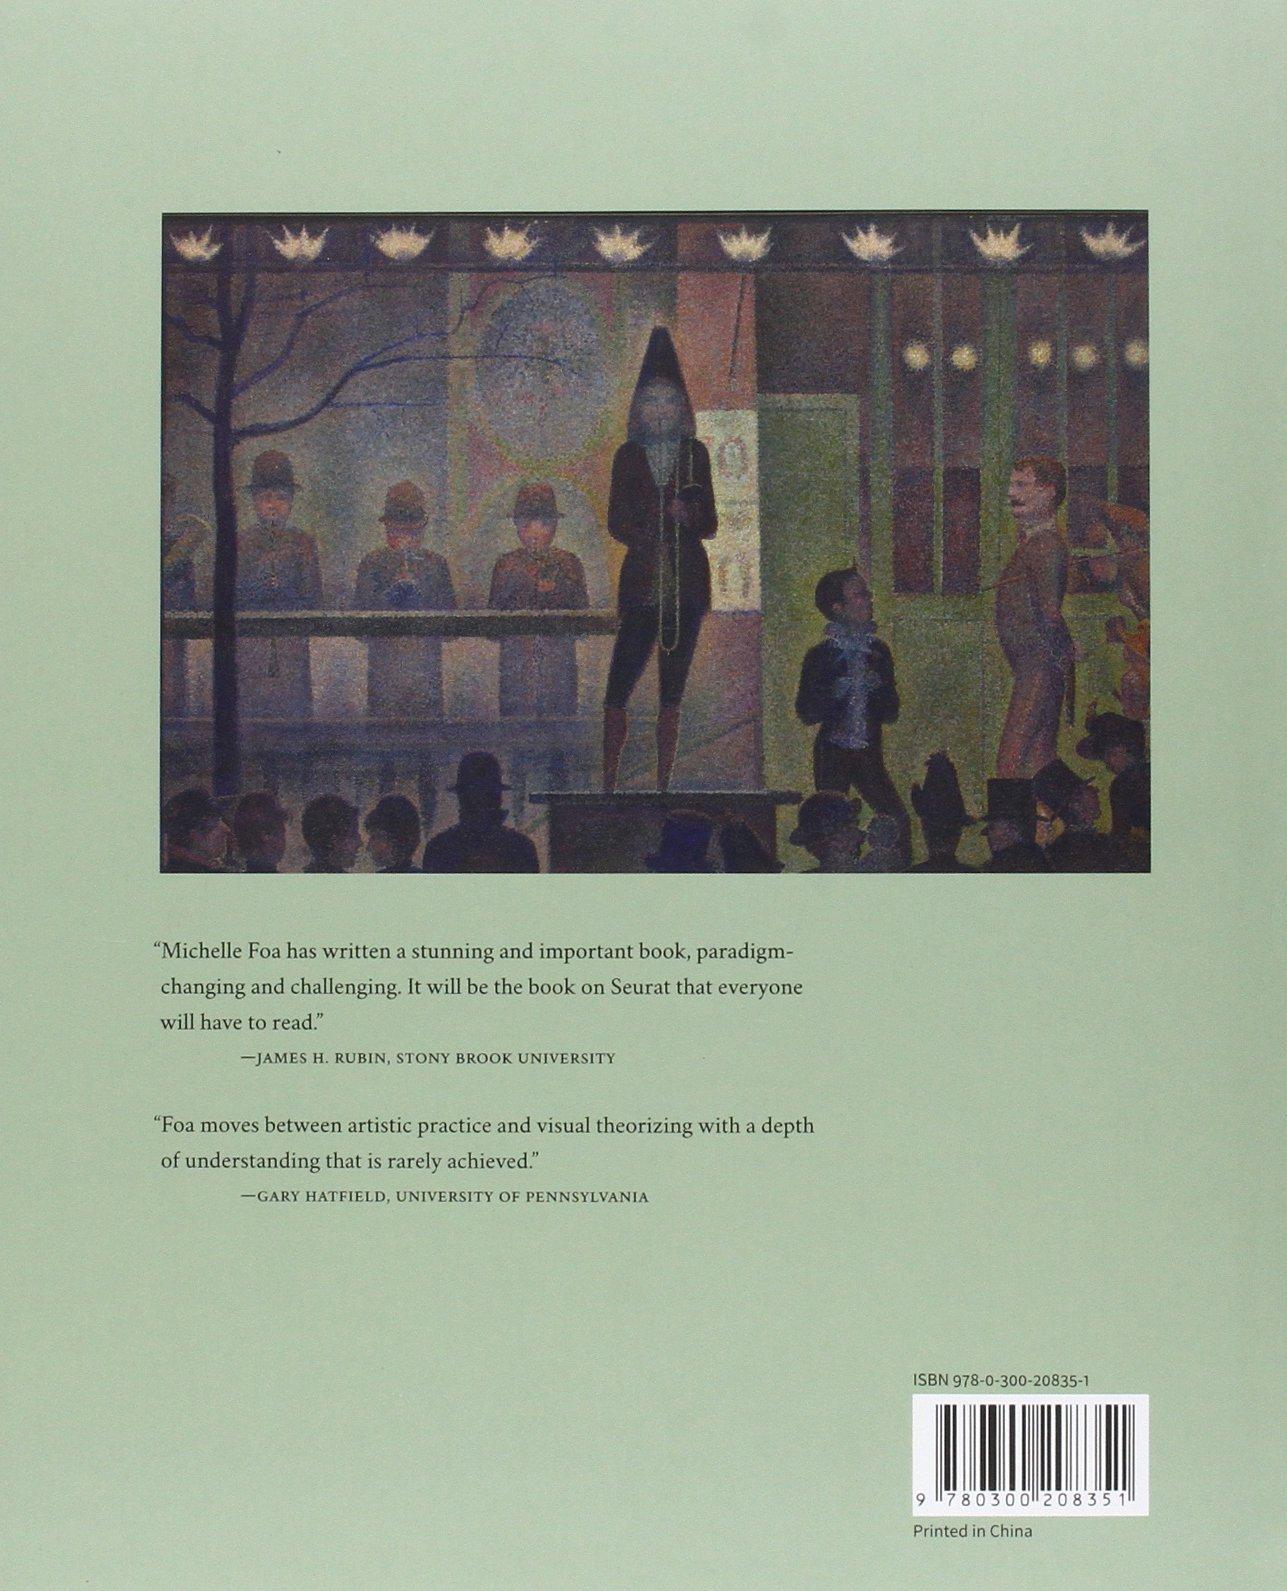 georges seurat the art of vision michelle foa 9780300208351 amazoncom books - Visual Paradigm 102